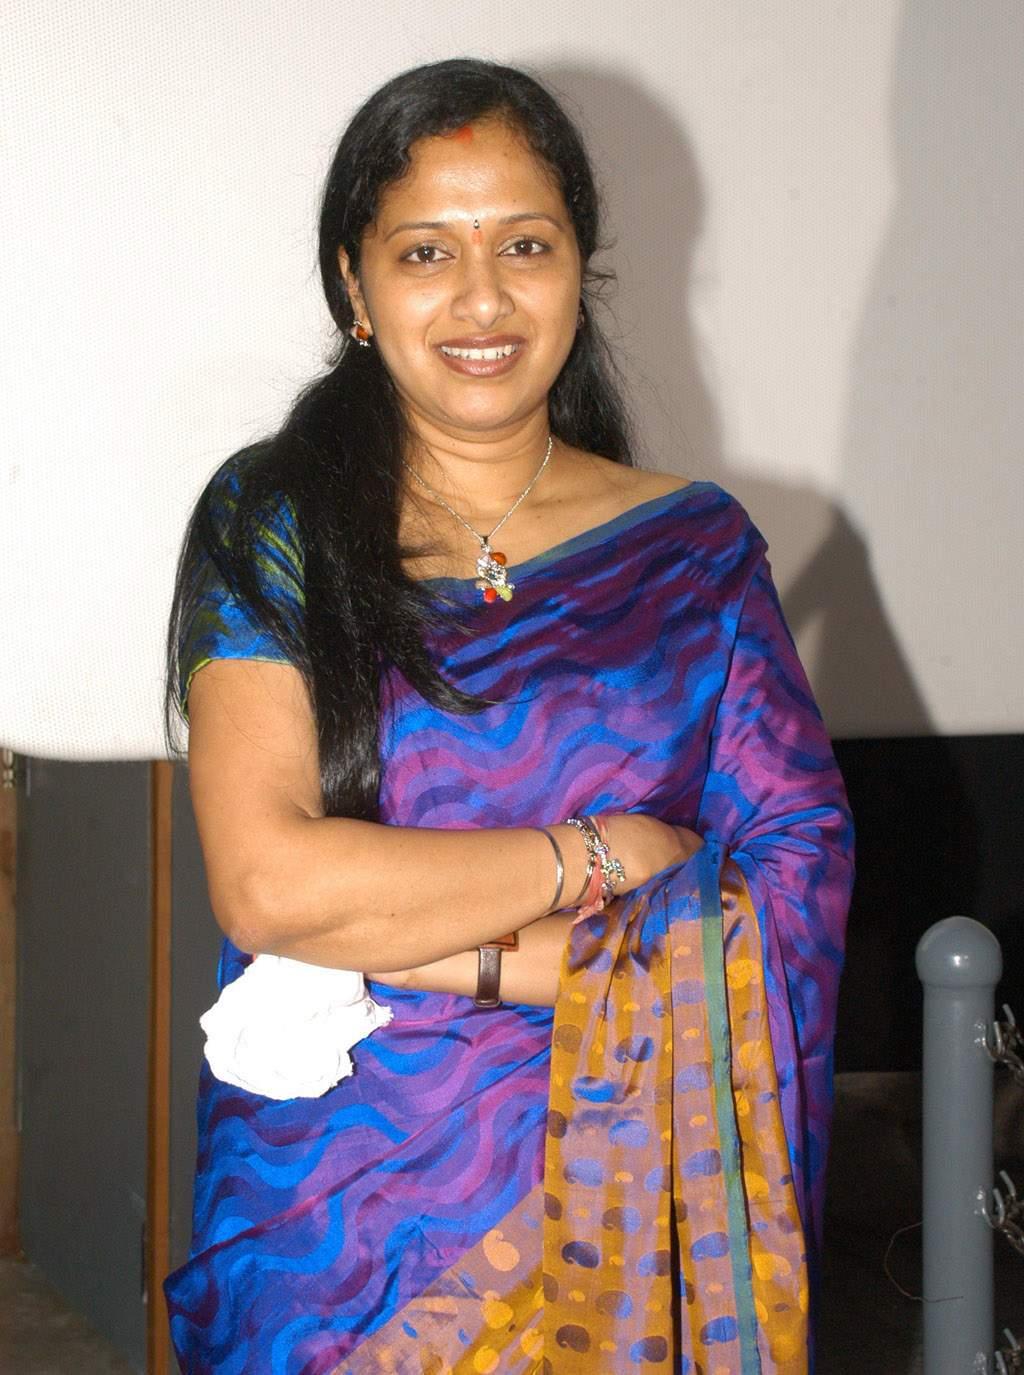 http://3.bp.blogspot.com/-4rUafAhH8WY/T0BP8PCUJfI/AAAAAAAAH7s/F7NXpuXdo8I/s1600/Tv-anchor-Anita-Chaudary-in-blue-saree-photos_01.jpg